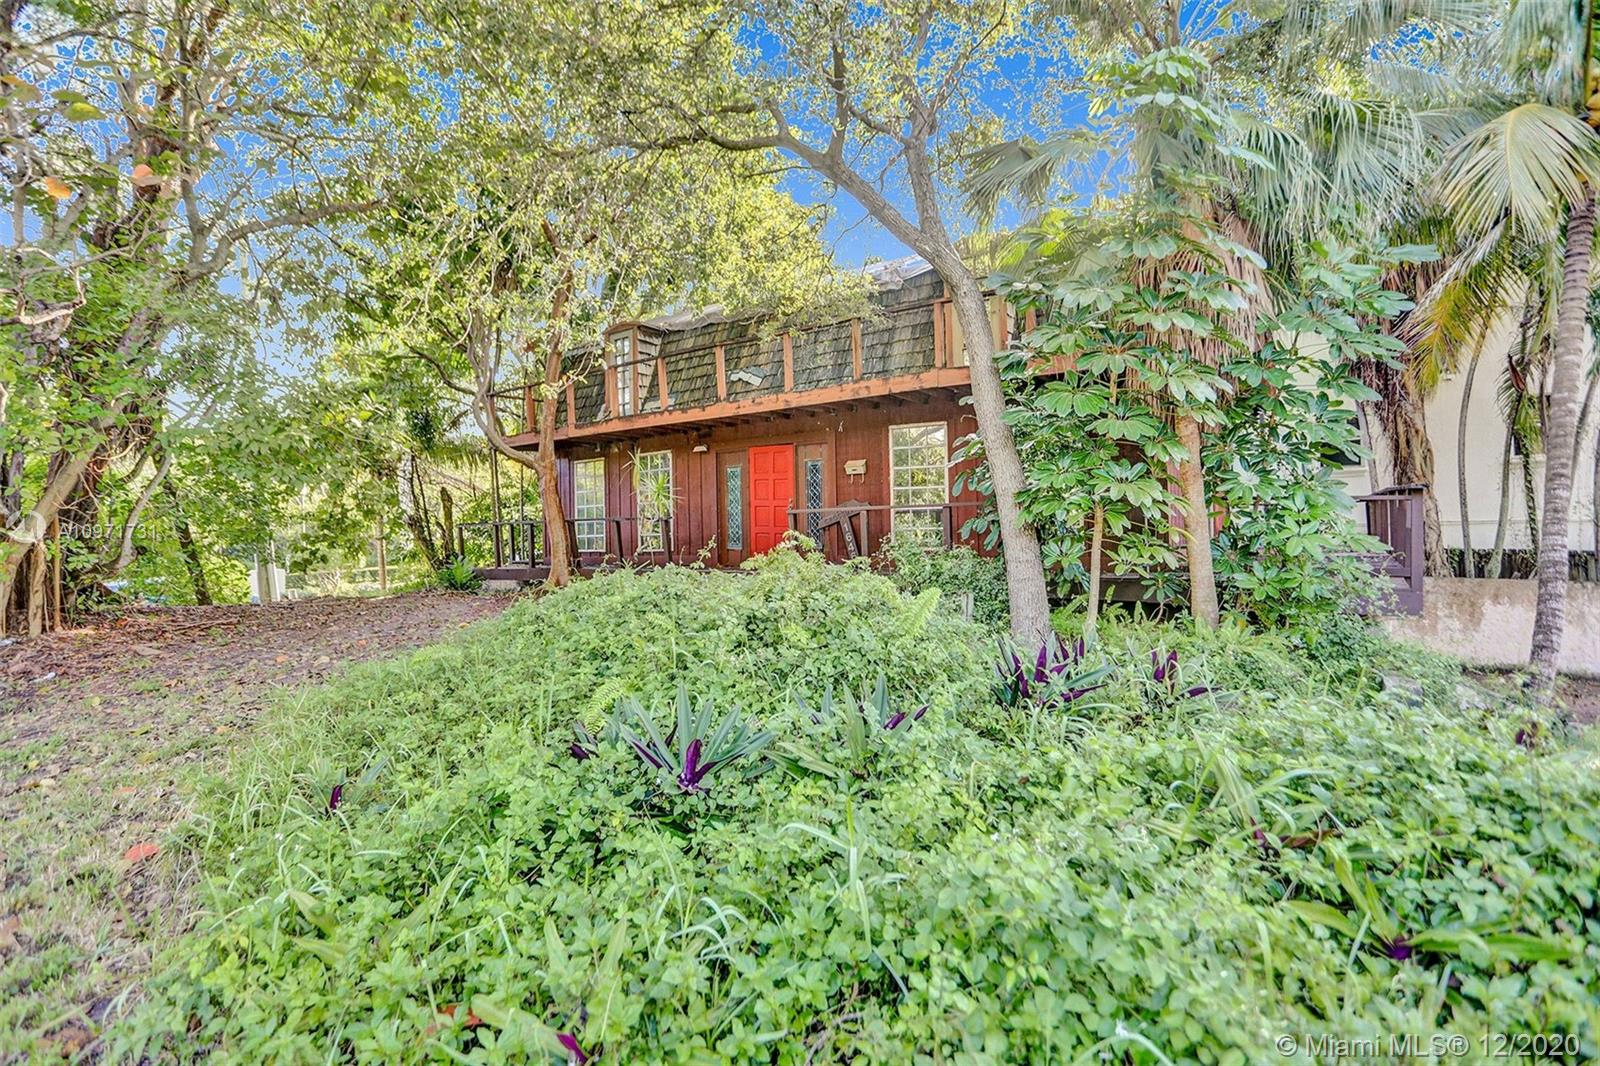 1646 S Bayshore Dr, Miami, Florida 33133, 2 Bedrooms Bedrooms, ,2 BathroomsBathrooms,Residential,For Sale,1646 S Bayshore Dr,A10971731